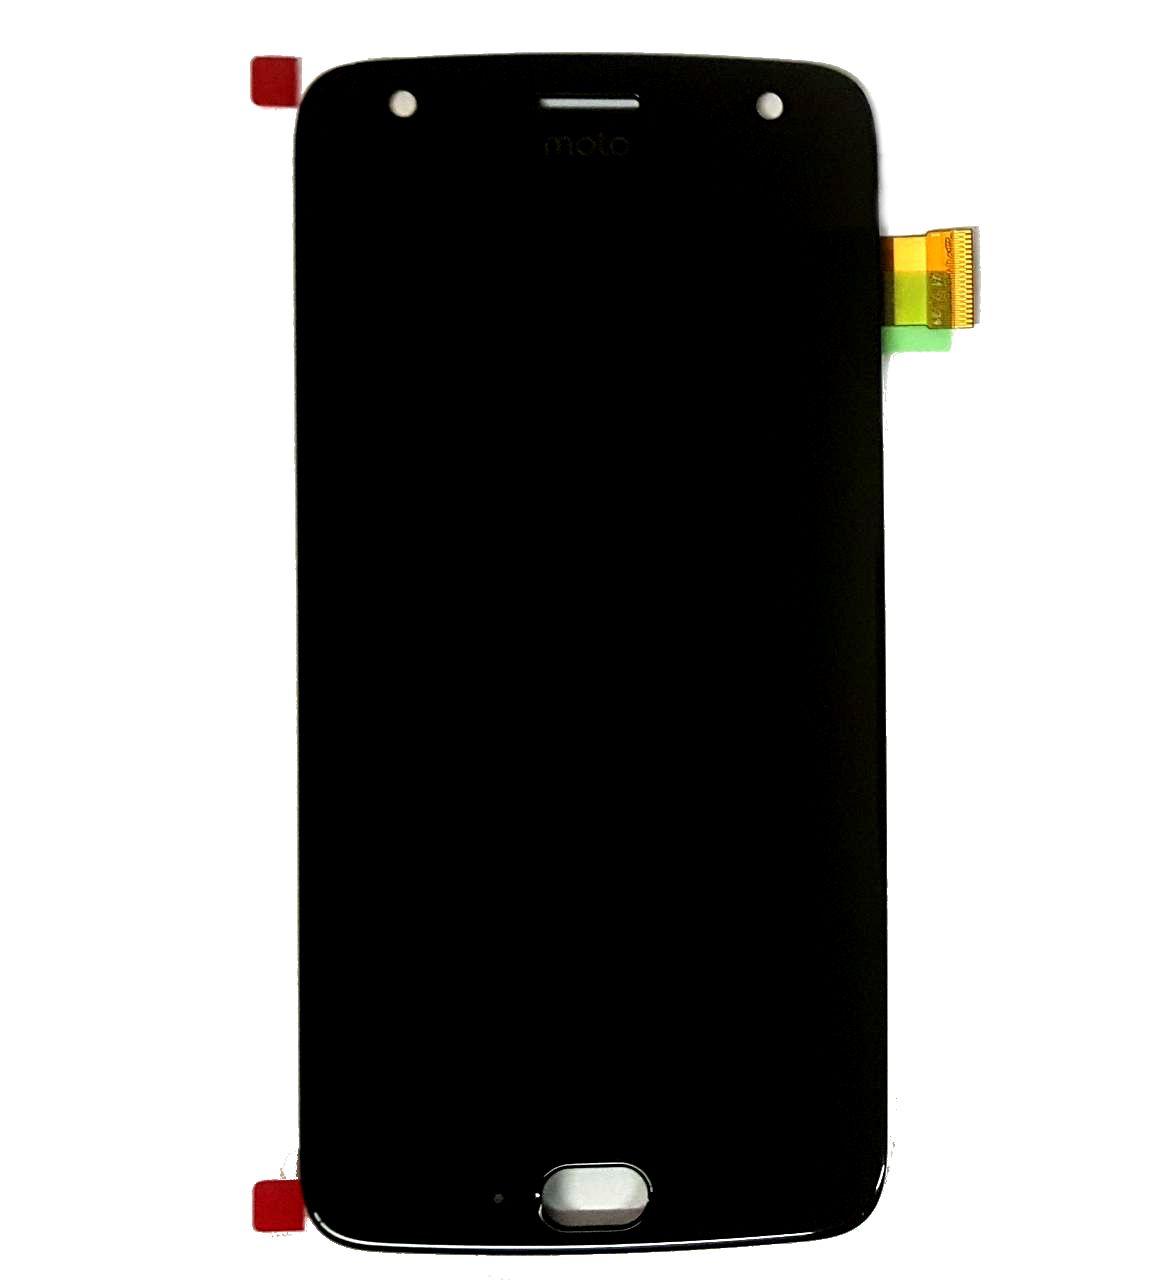 Display Frontal Moto X4 Preto XT1900 Original Nacional